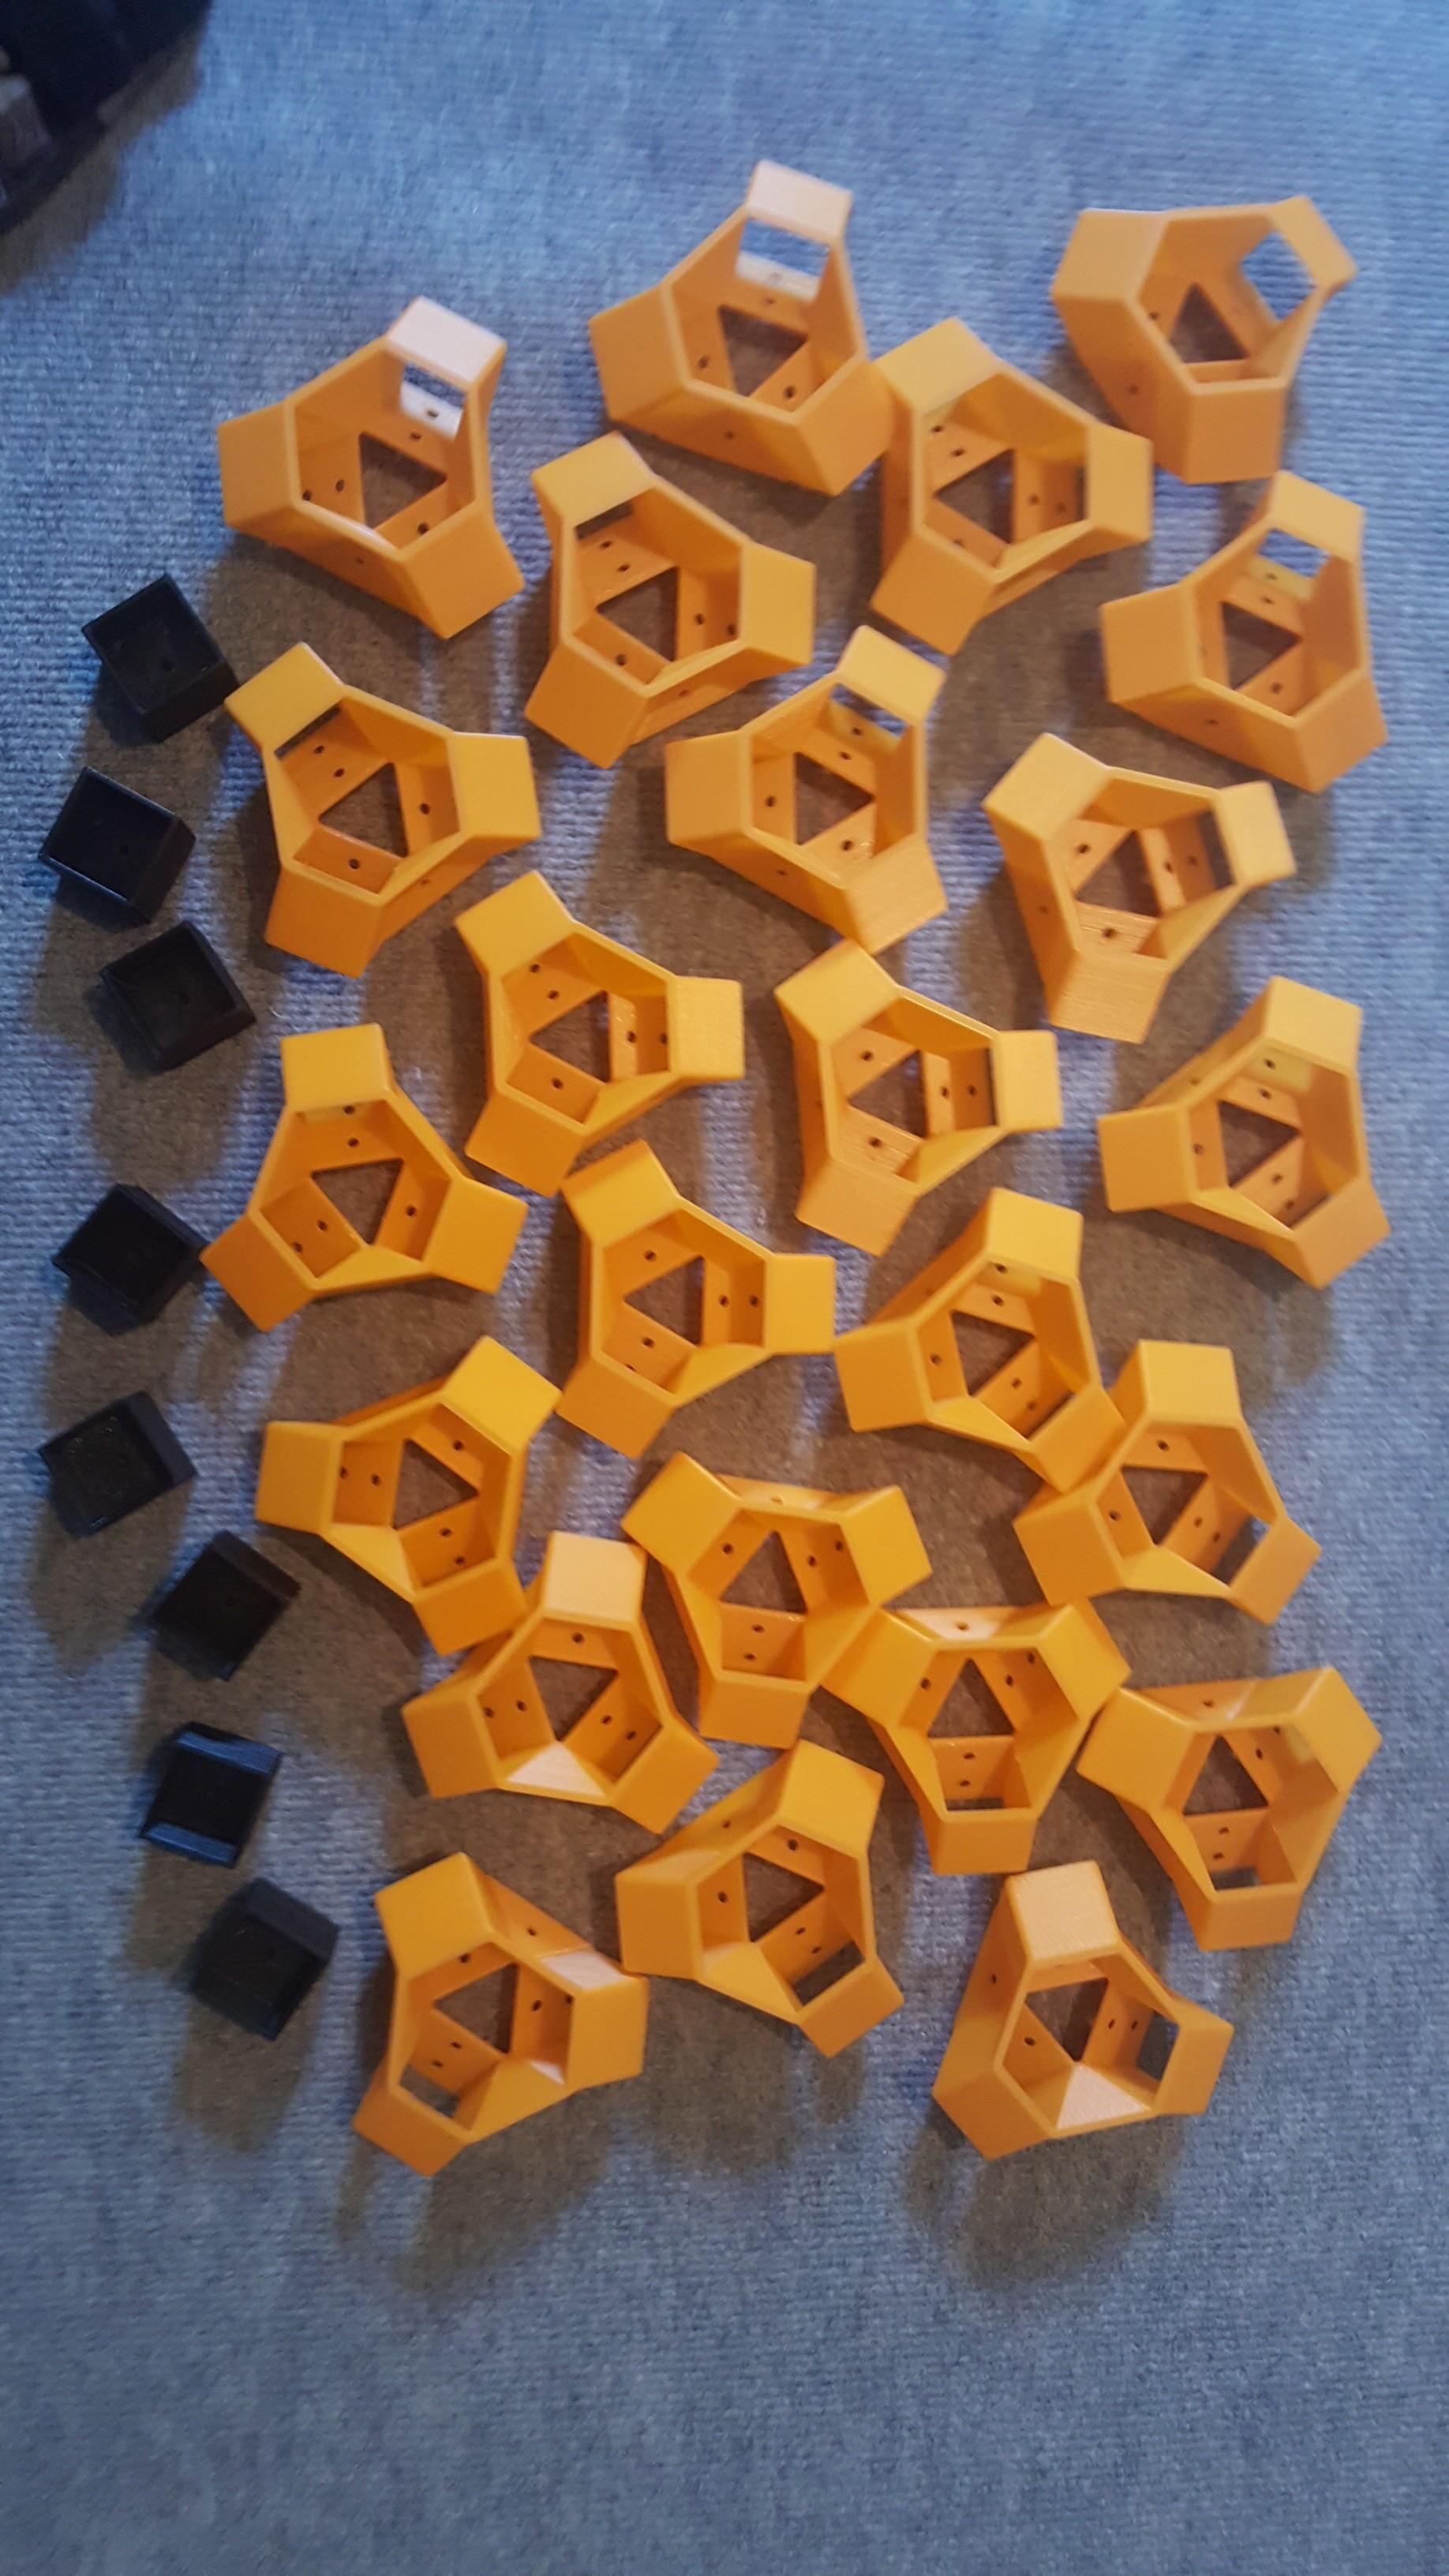 FB_IMG_1506179672097.jpg Download free STL file 3D Printer Cabinet • 3D printing object, tristan24